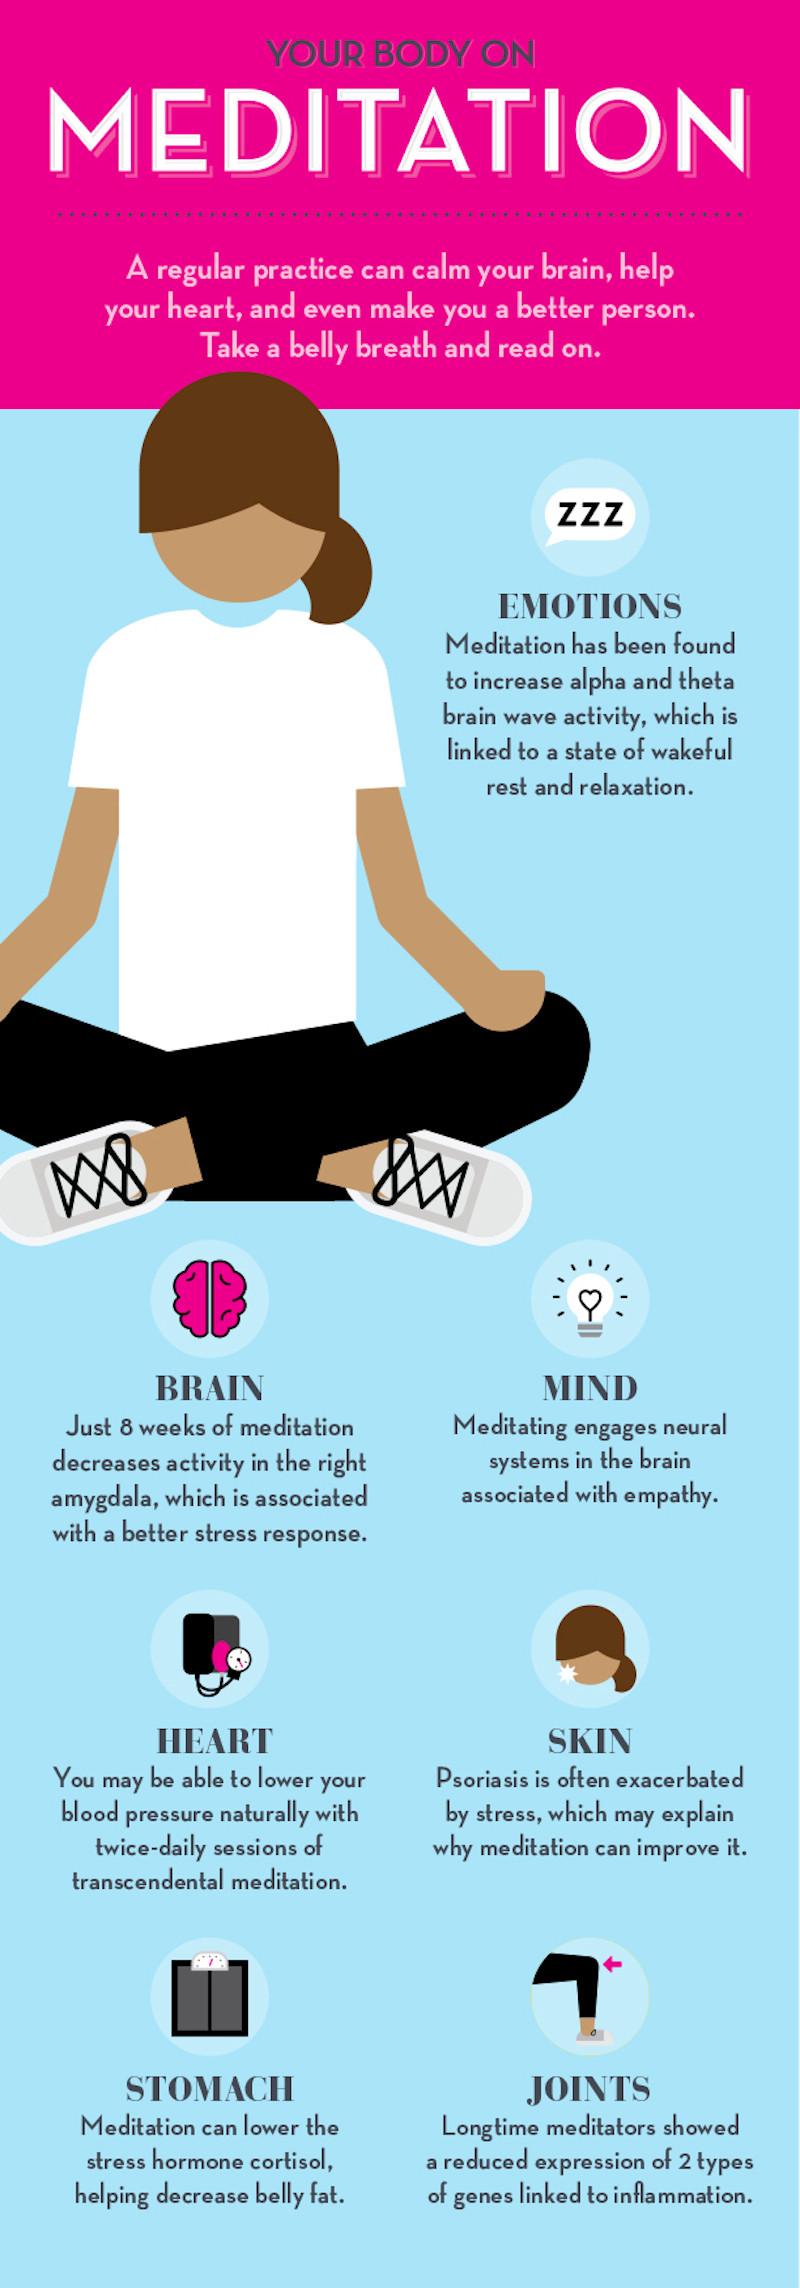 7 Benefits Of Meditation Infographic